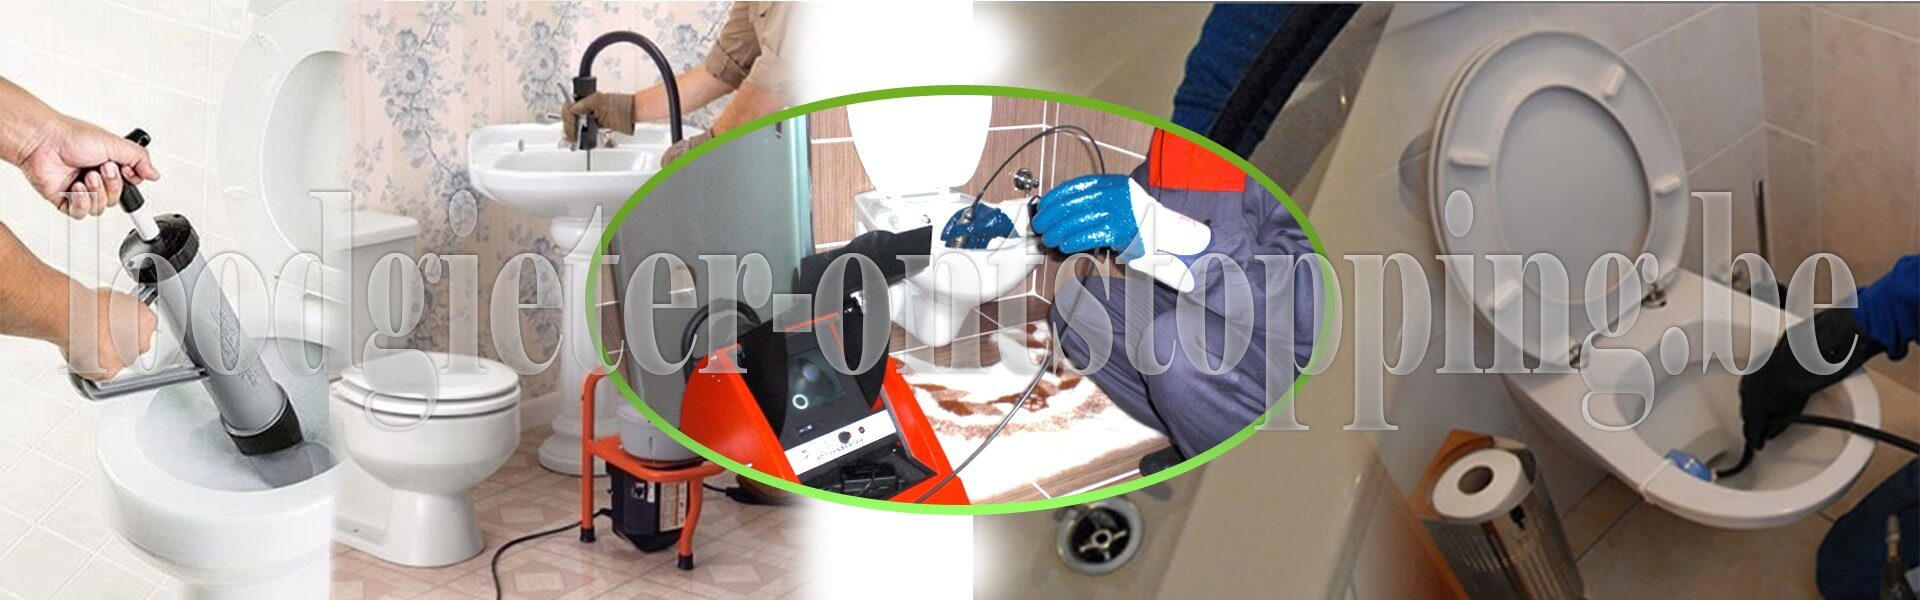 Loodgietersdienst & Ontstoppingsdienst WC